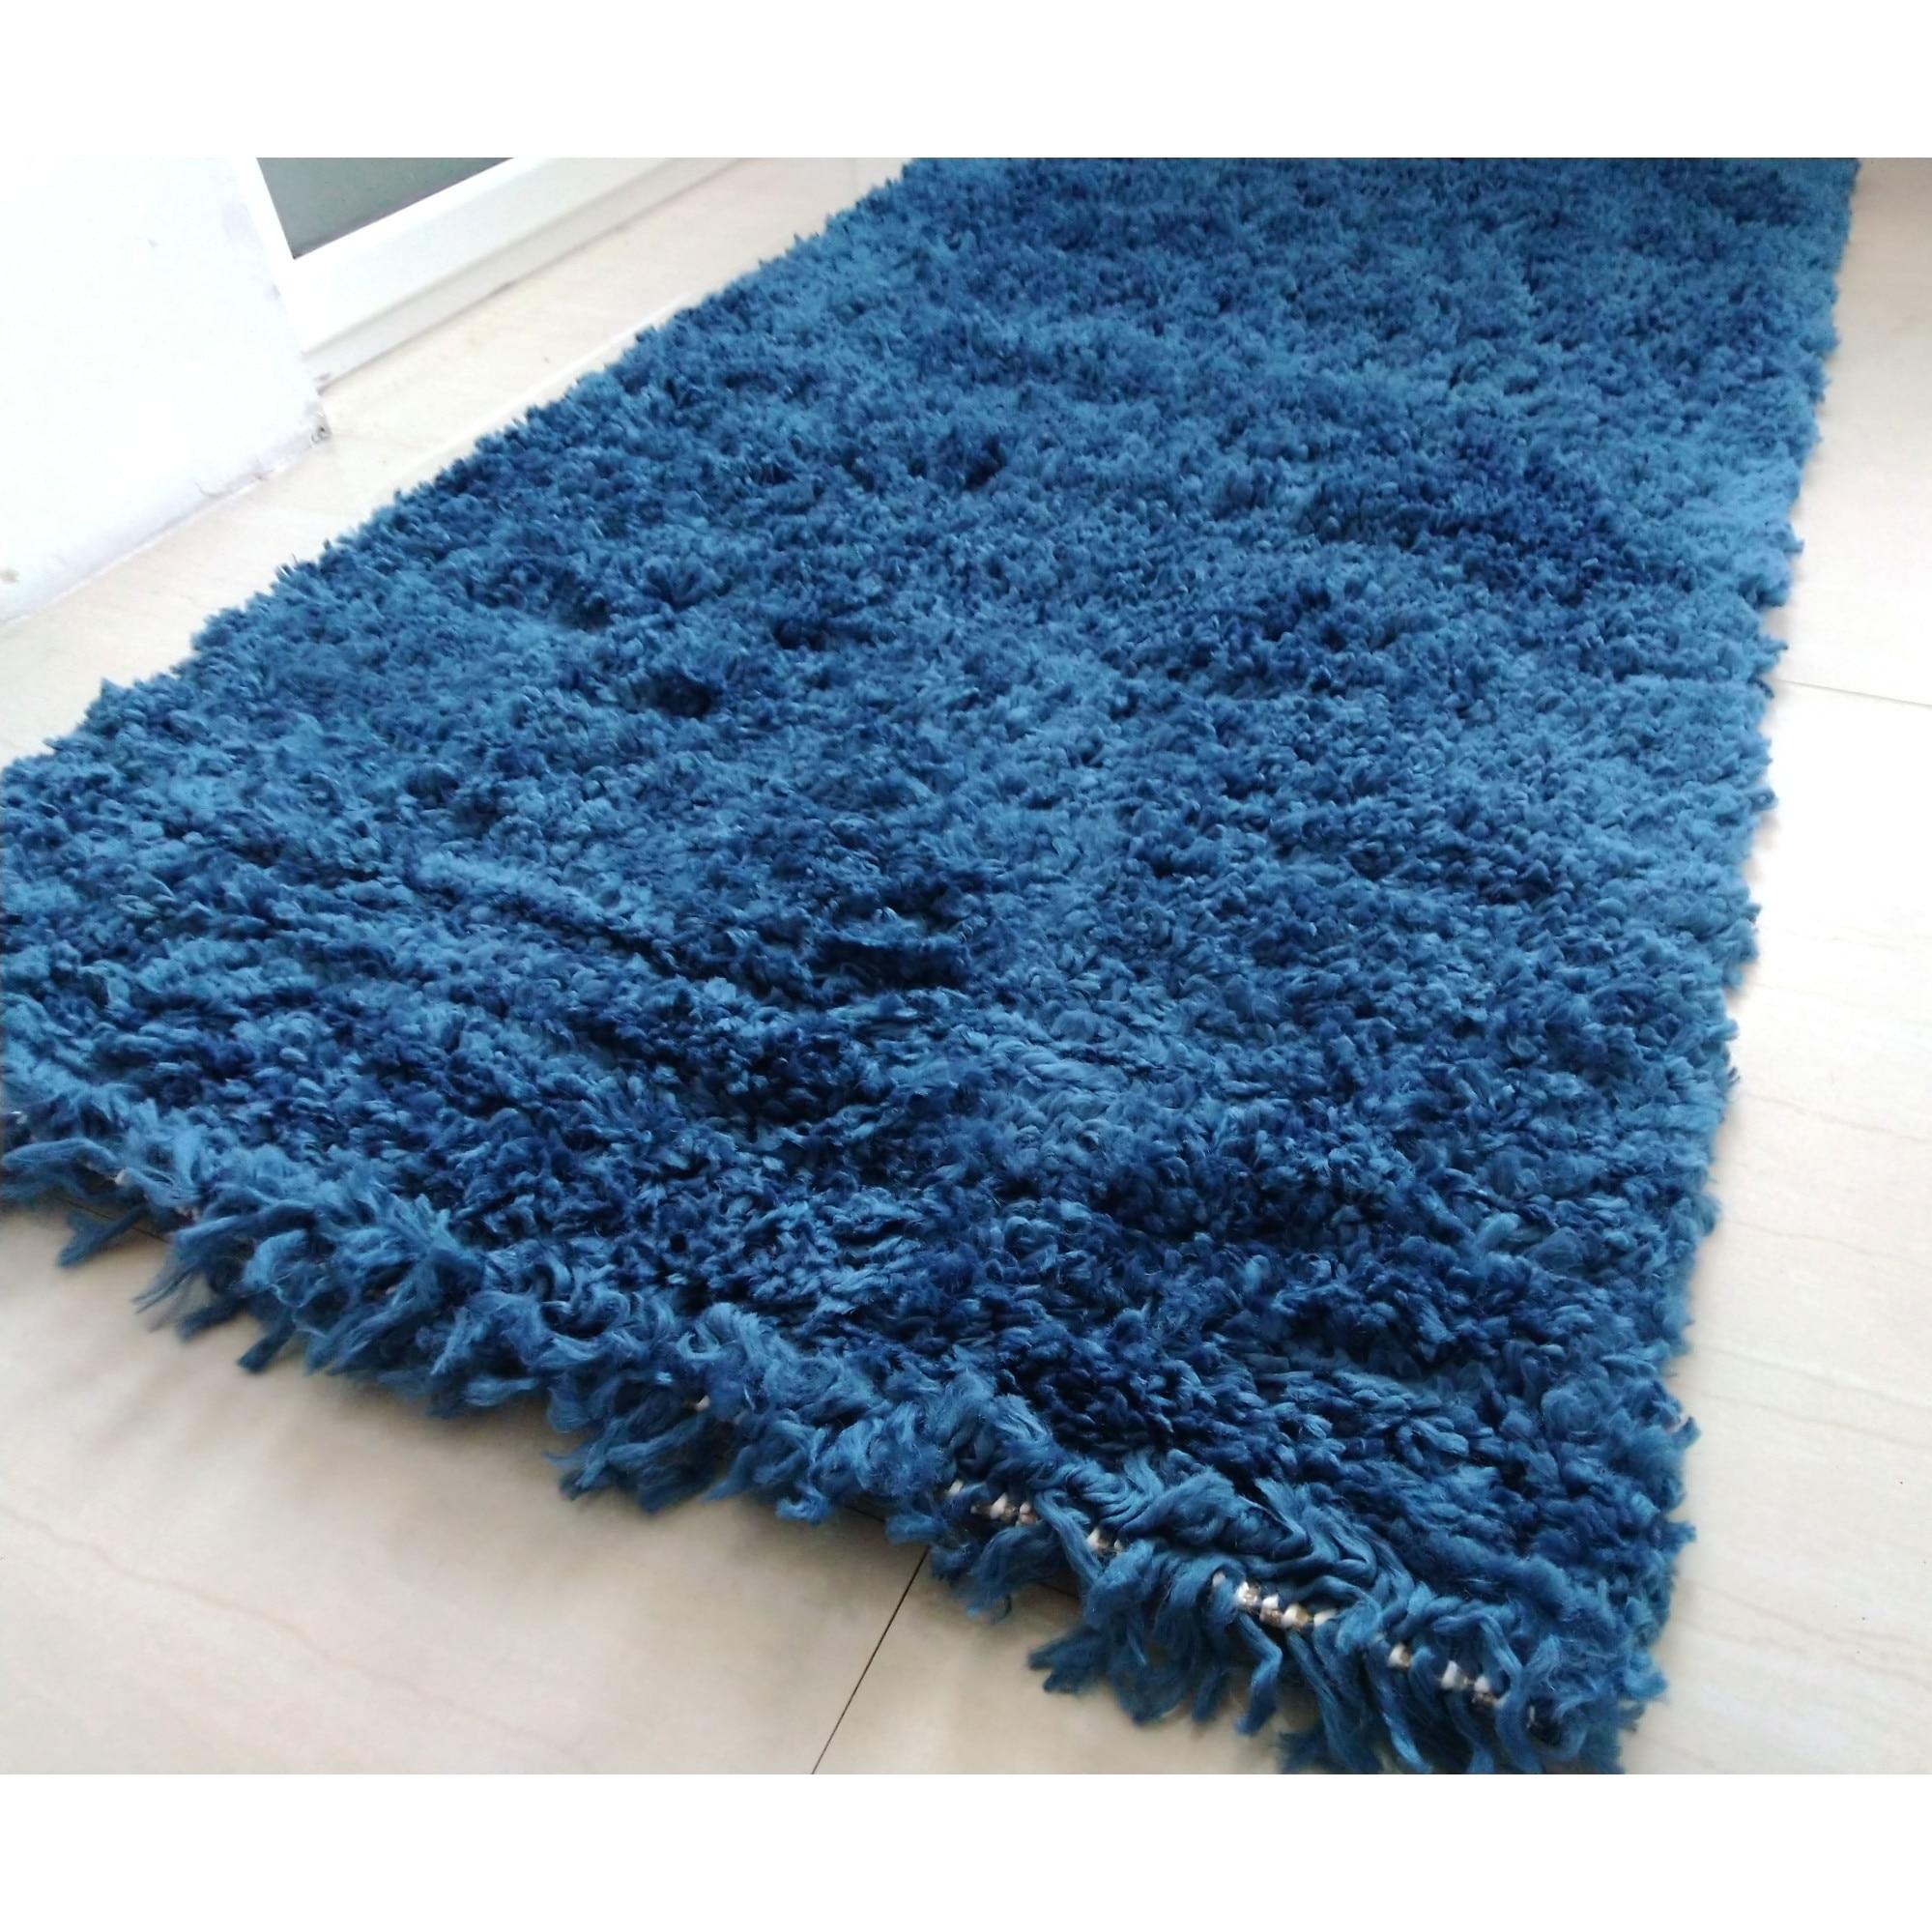 Kerek szőnyeg Evima Kék 65x65 cm eMAG.hu